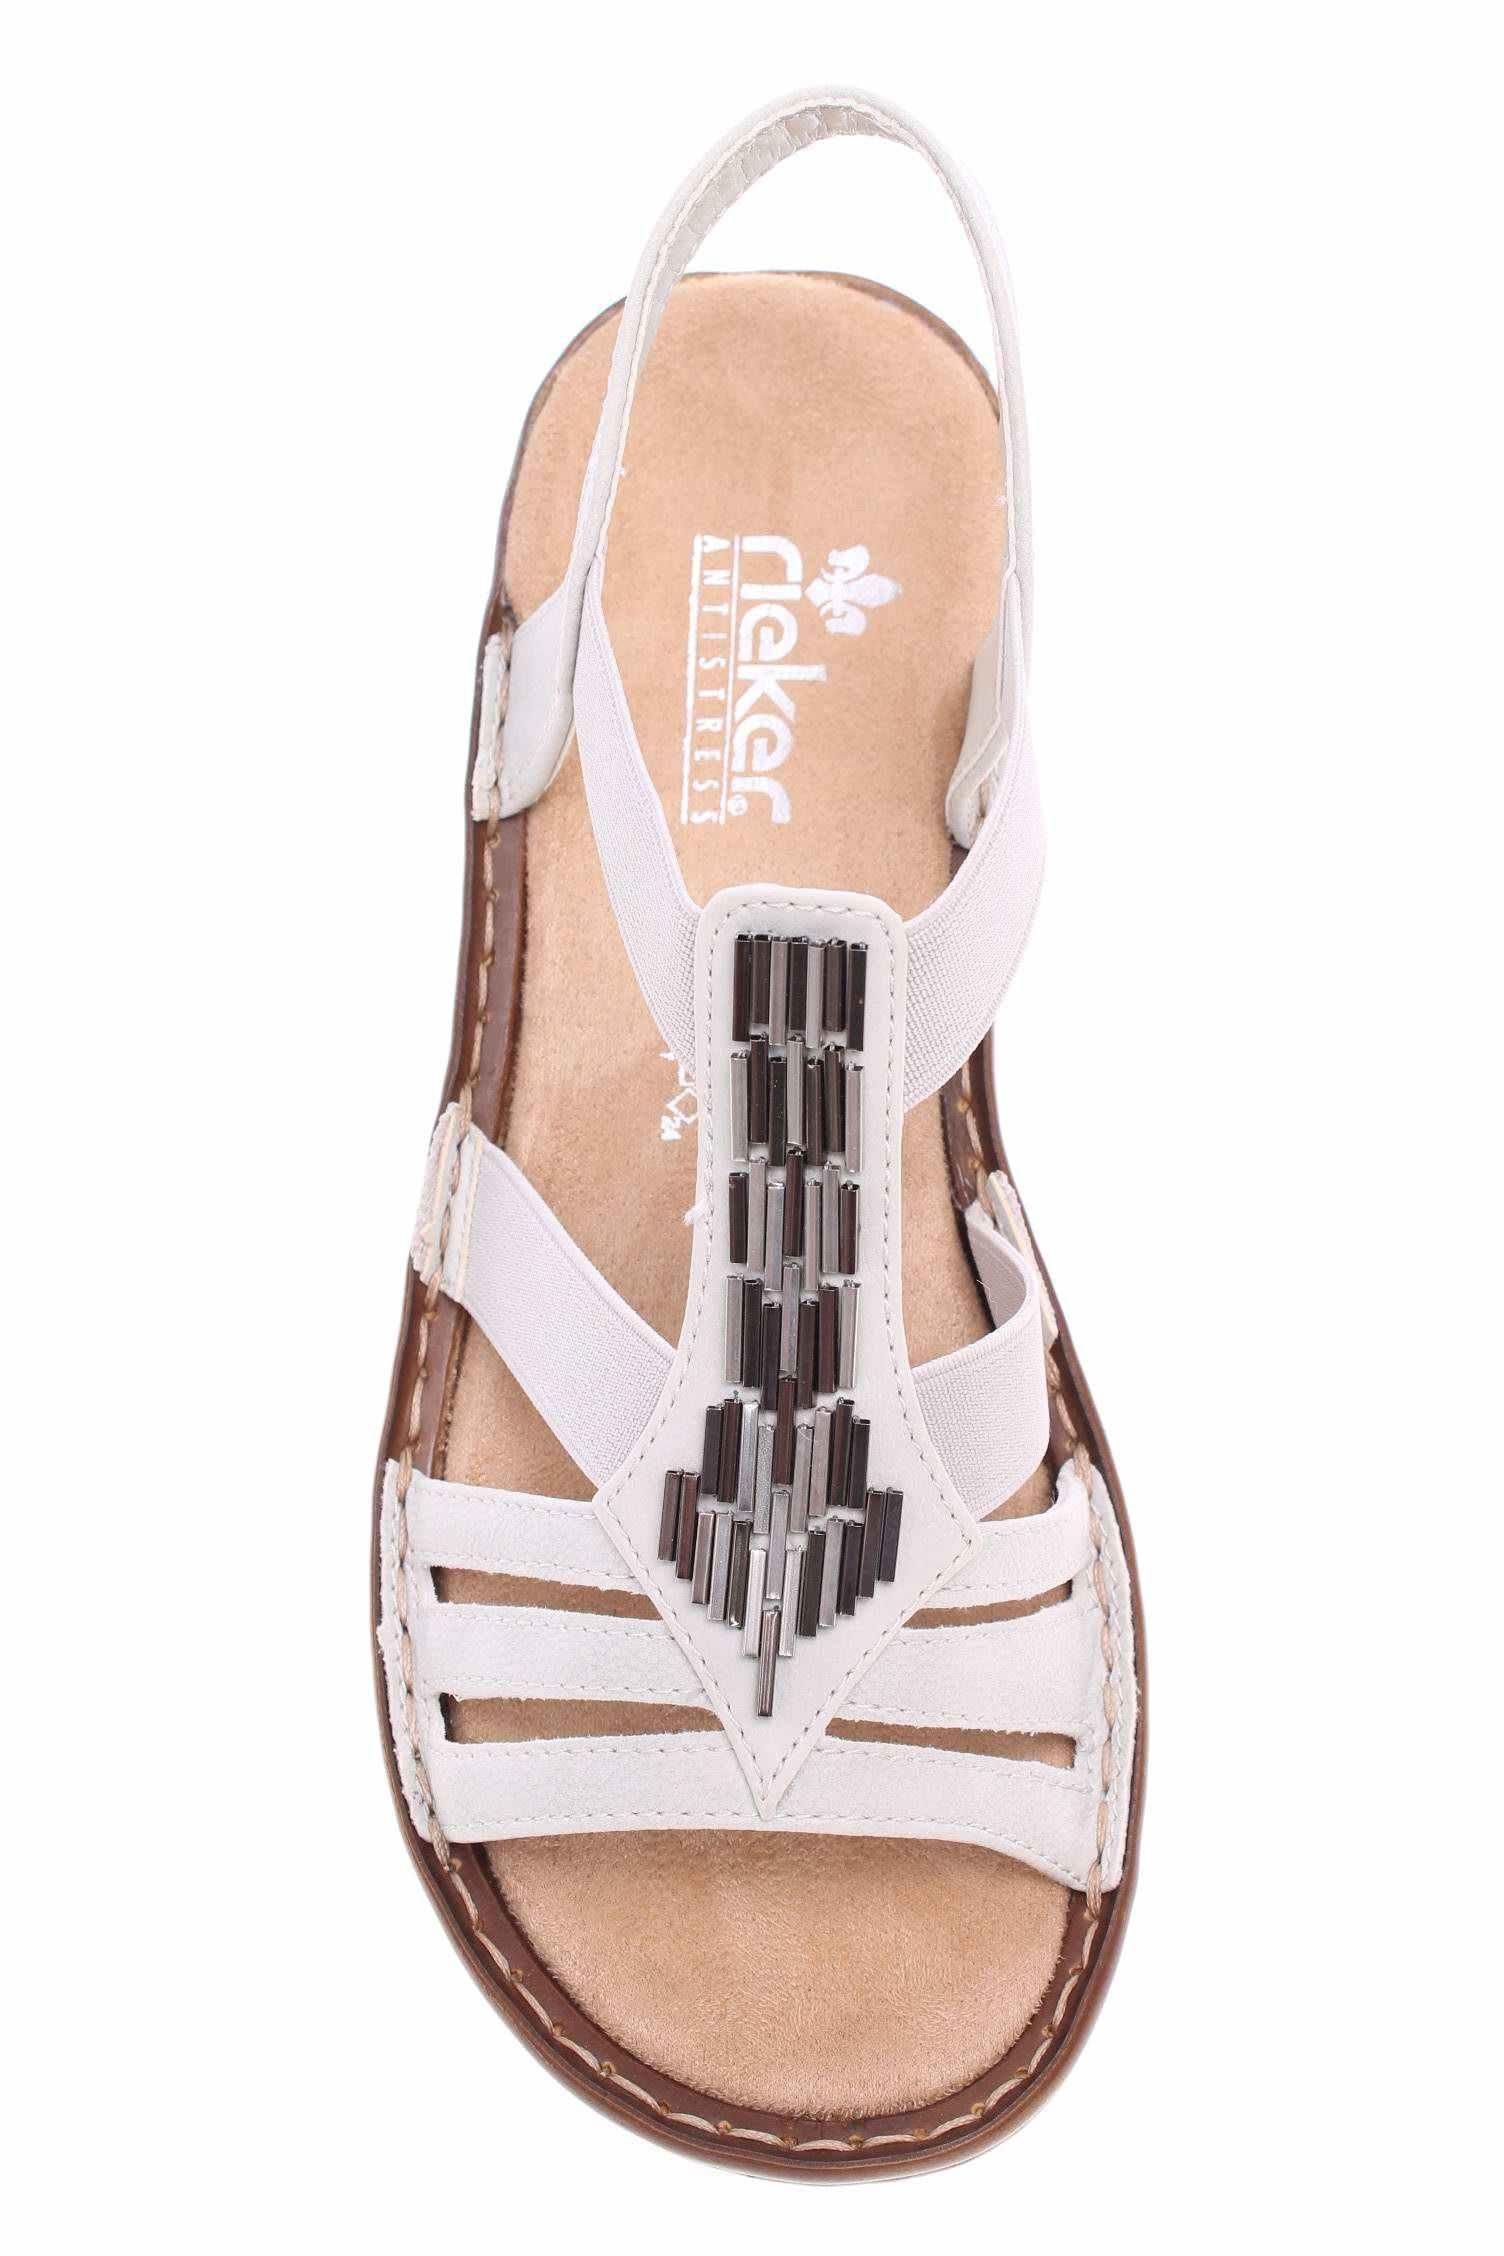 bdad37446dac Rieker dámské sandály 60800-80 weiss